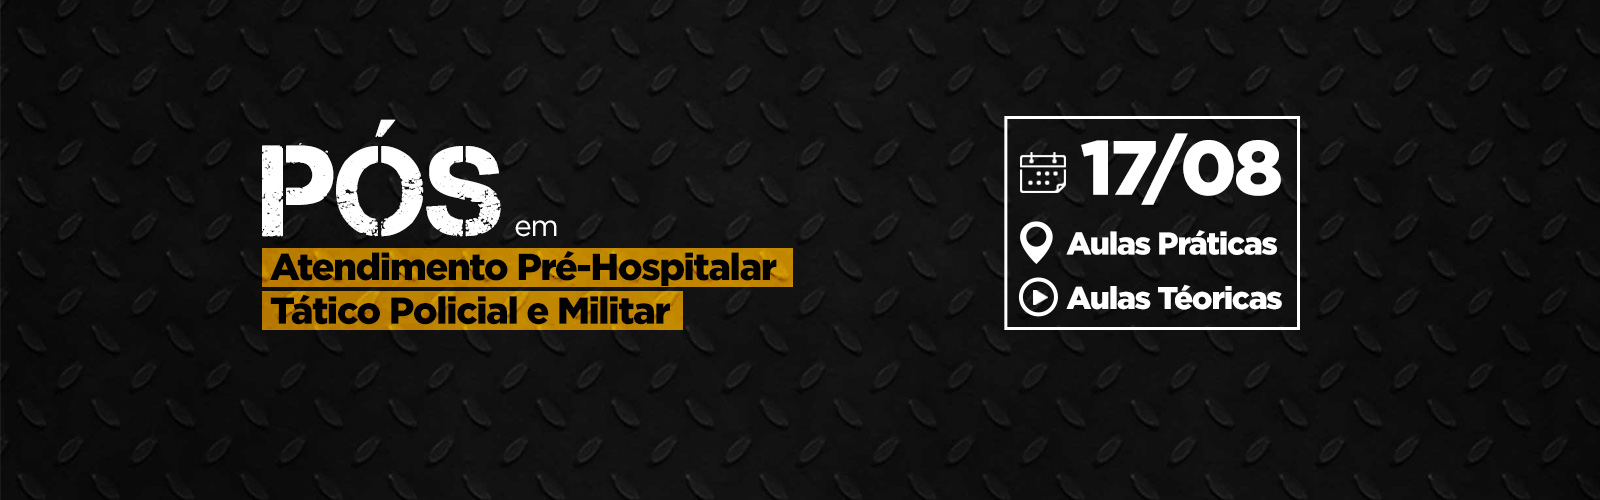 Atendimento Pré-Hospitalar Tático Policial e Militar